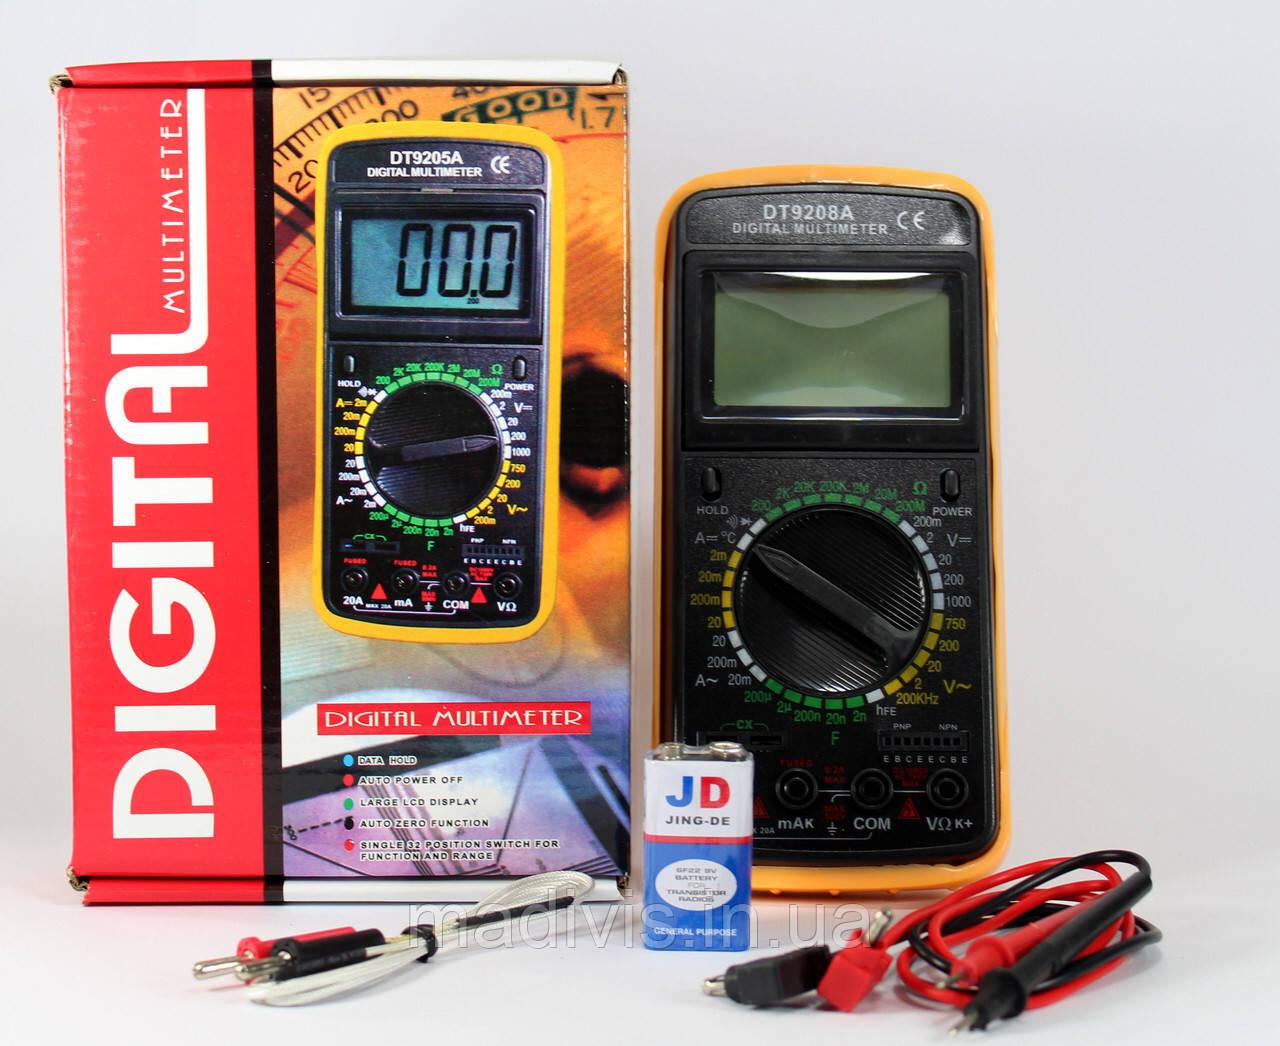 Мультиметр DT 9205А